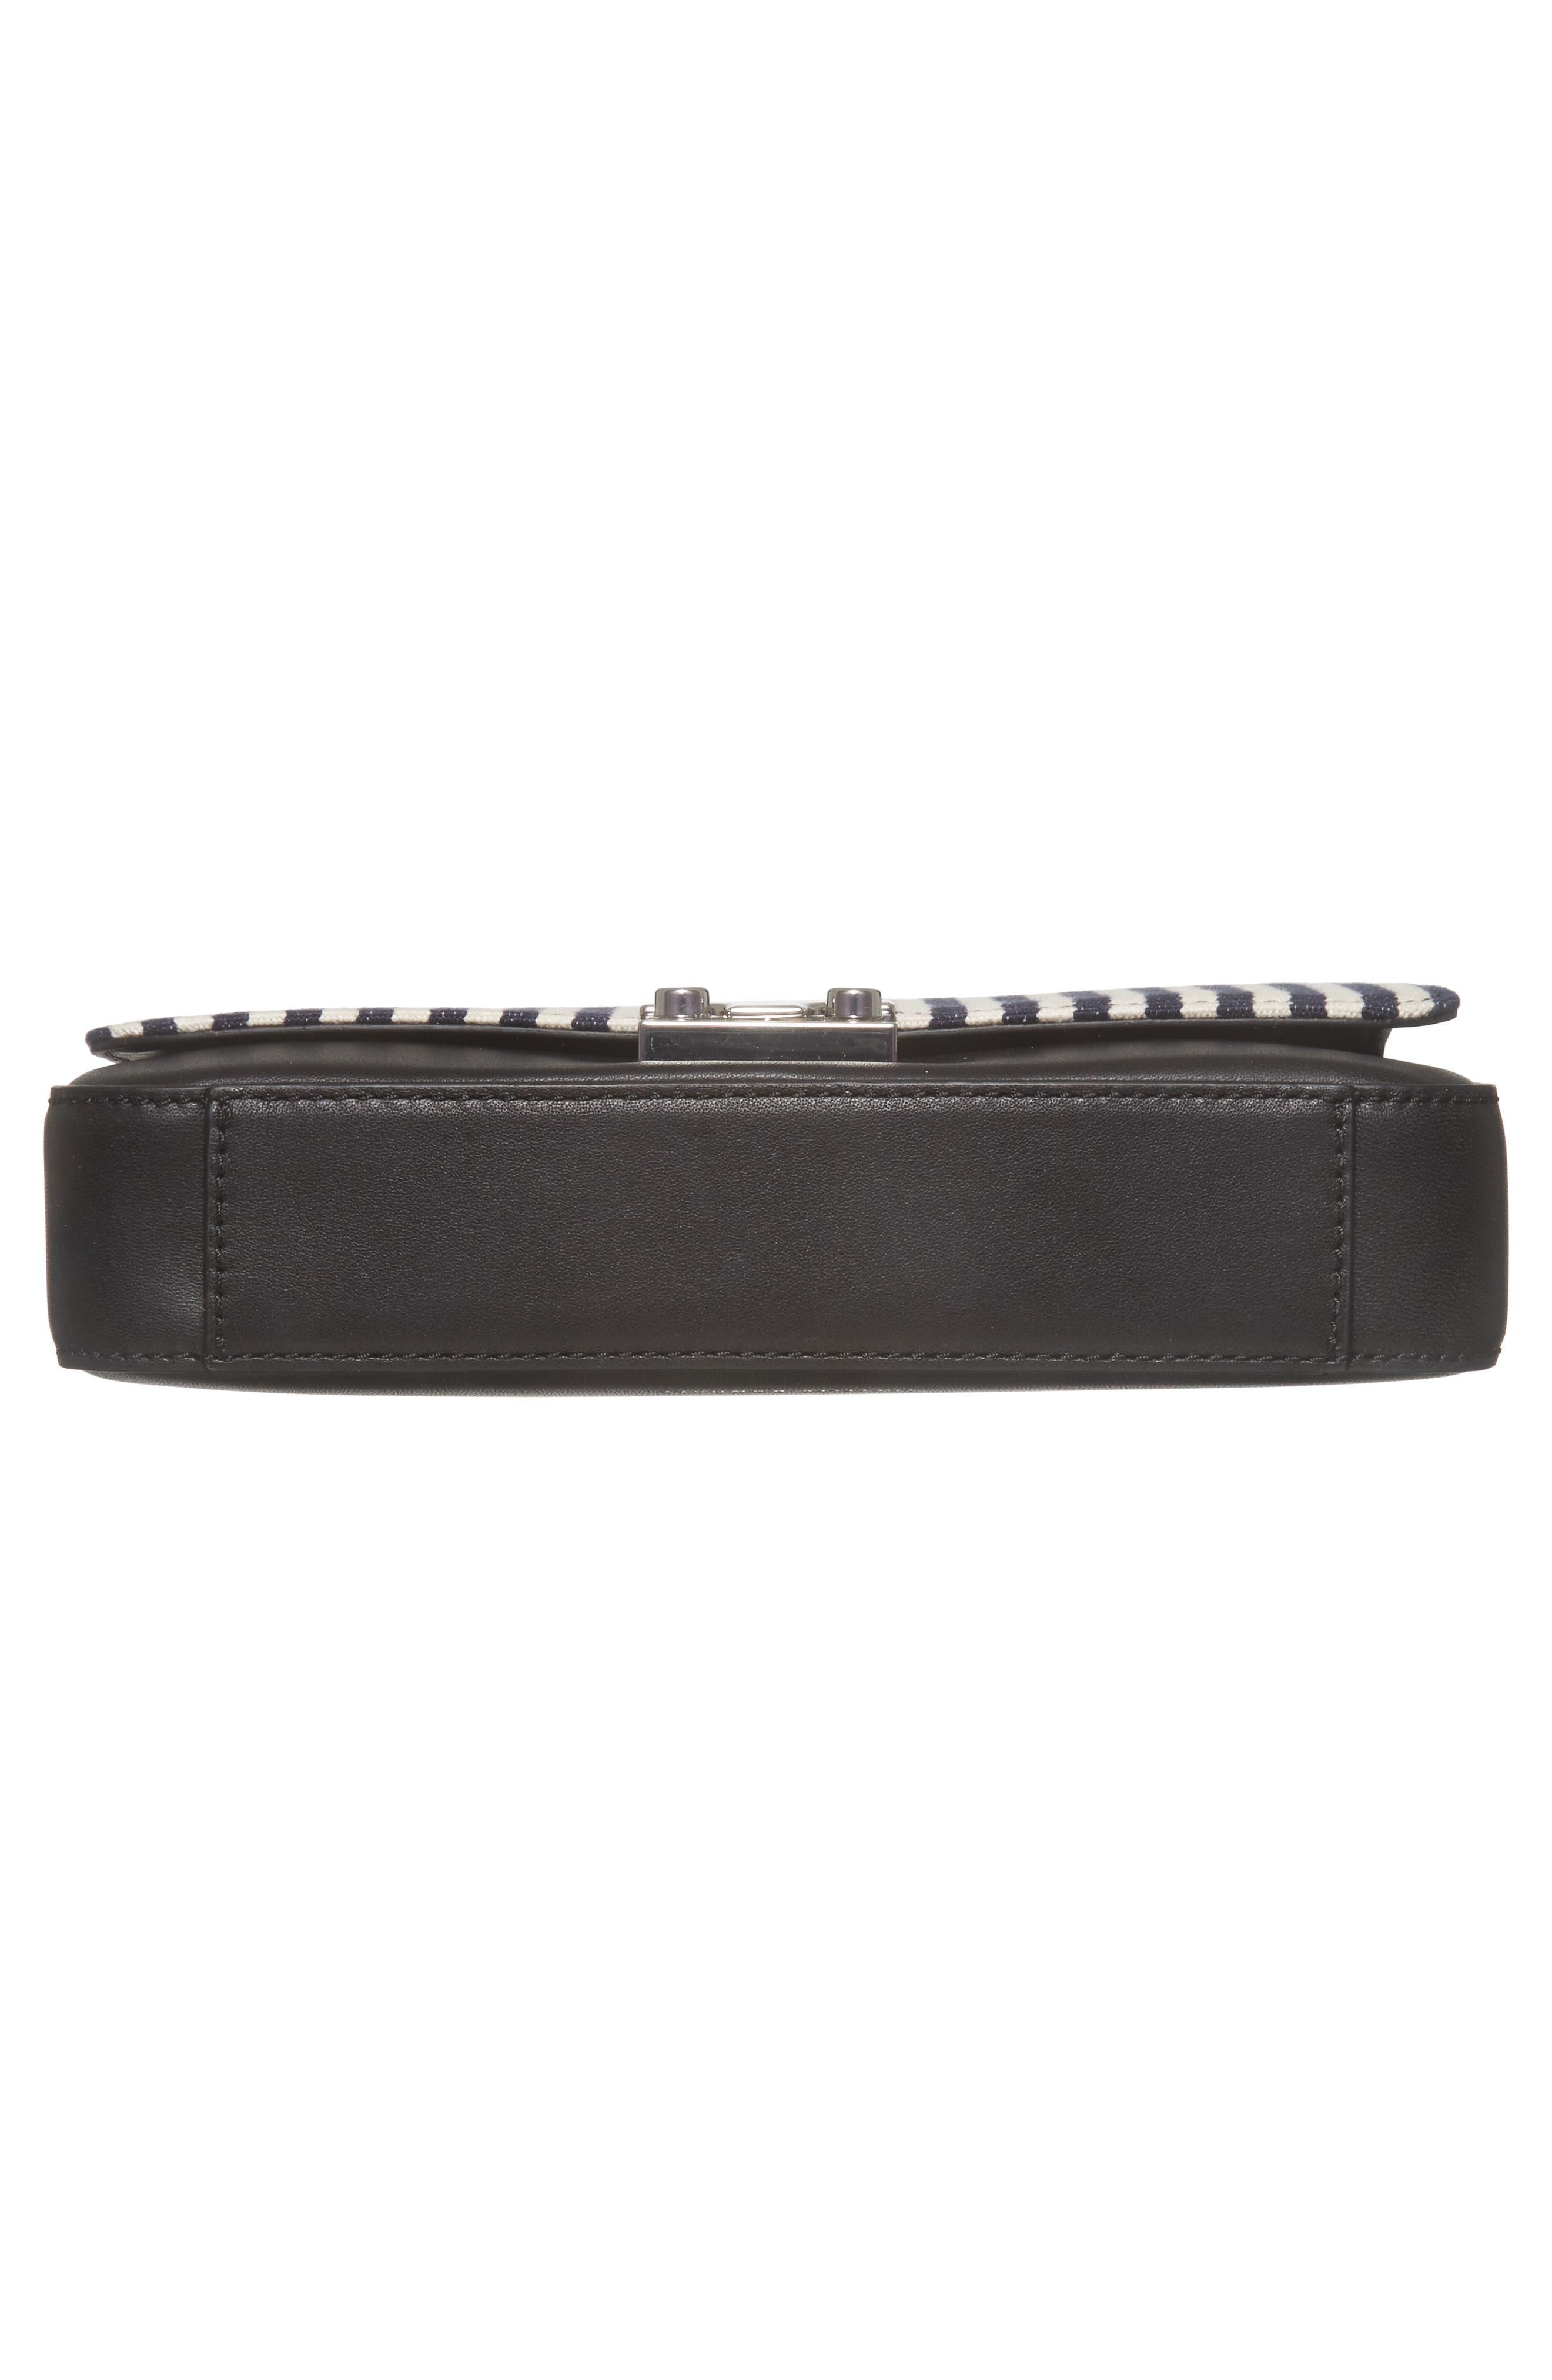 Lock Stripe Clutch/Shoulder Bag,                             Alternate thumbnail 6, color,                             White/ Eclipse